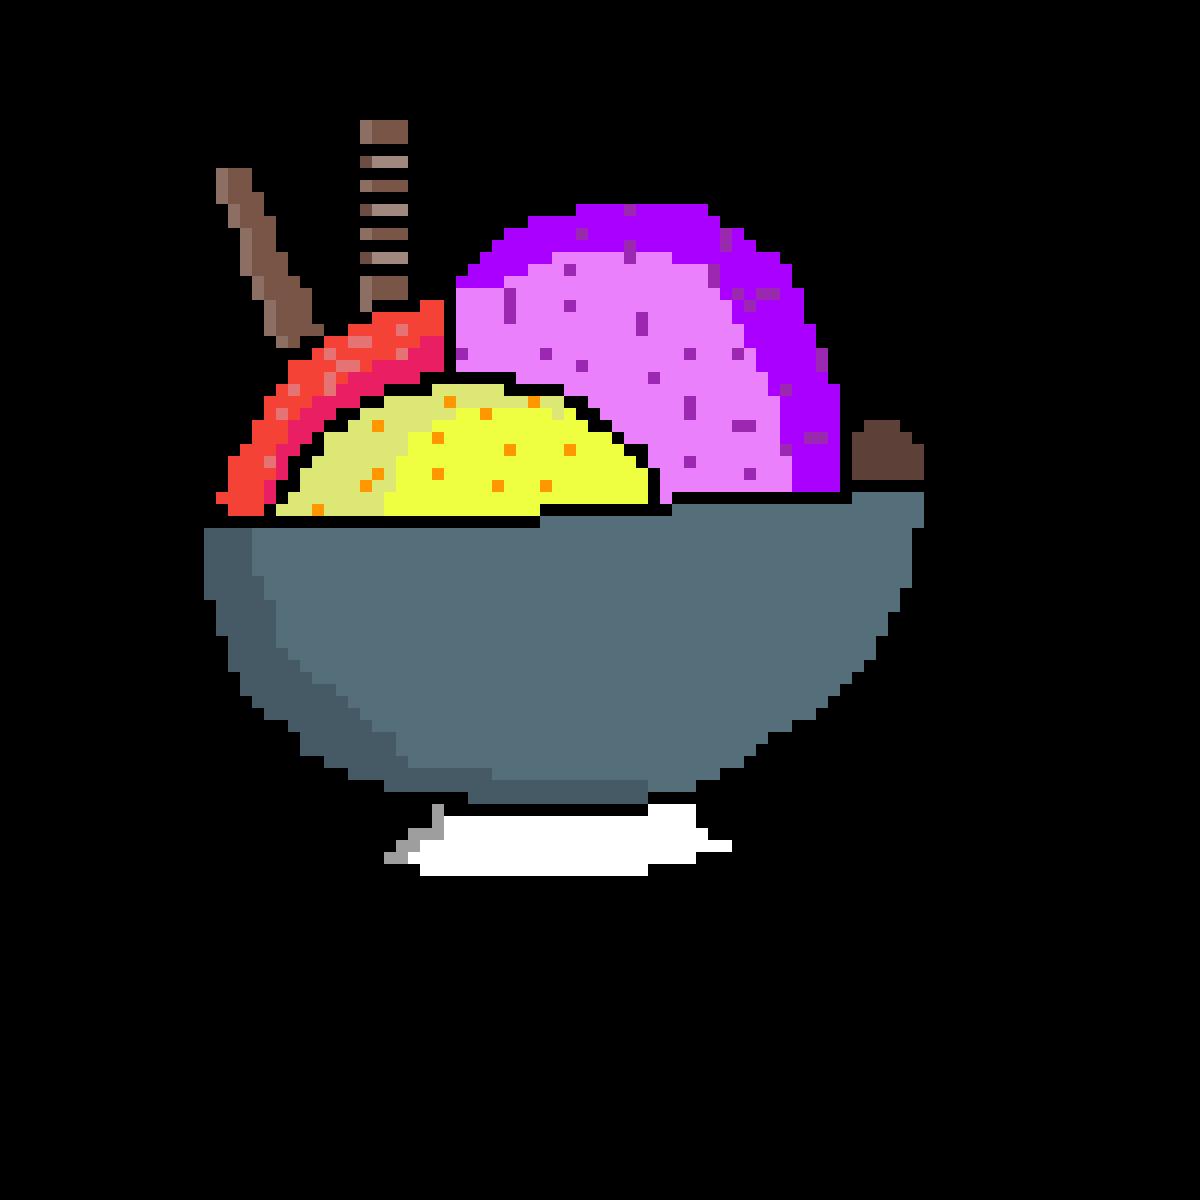 I.C. by Salad55